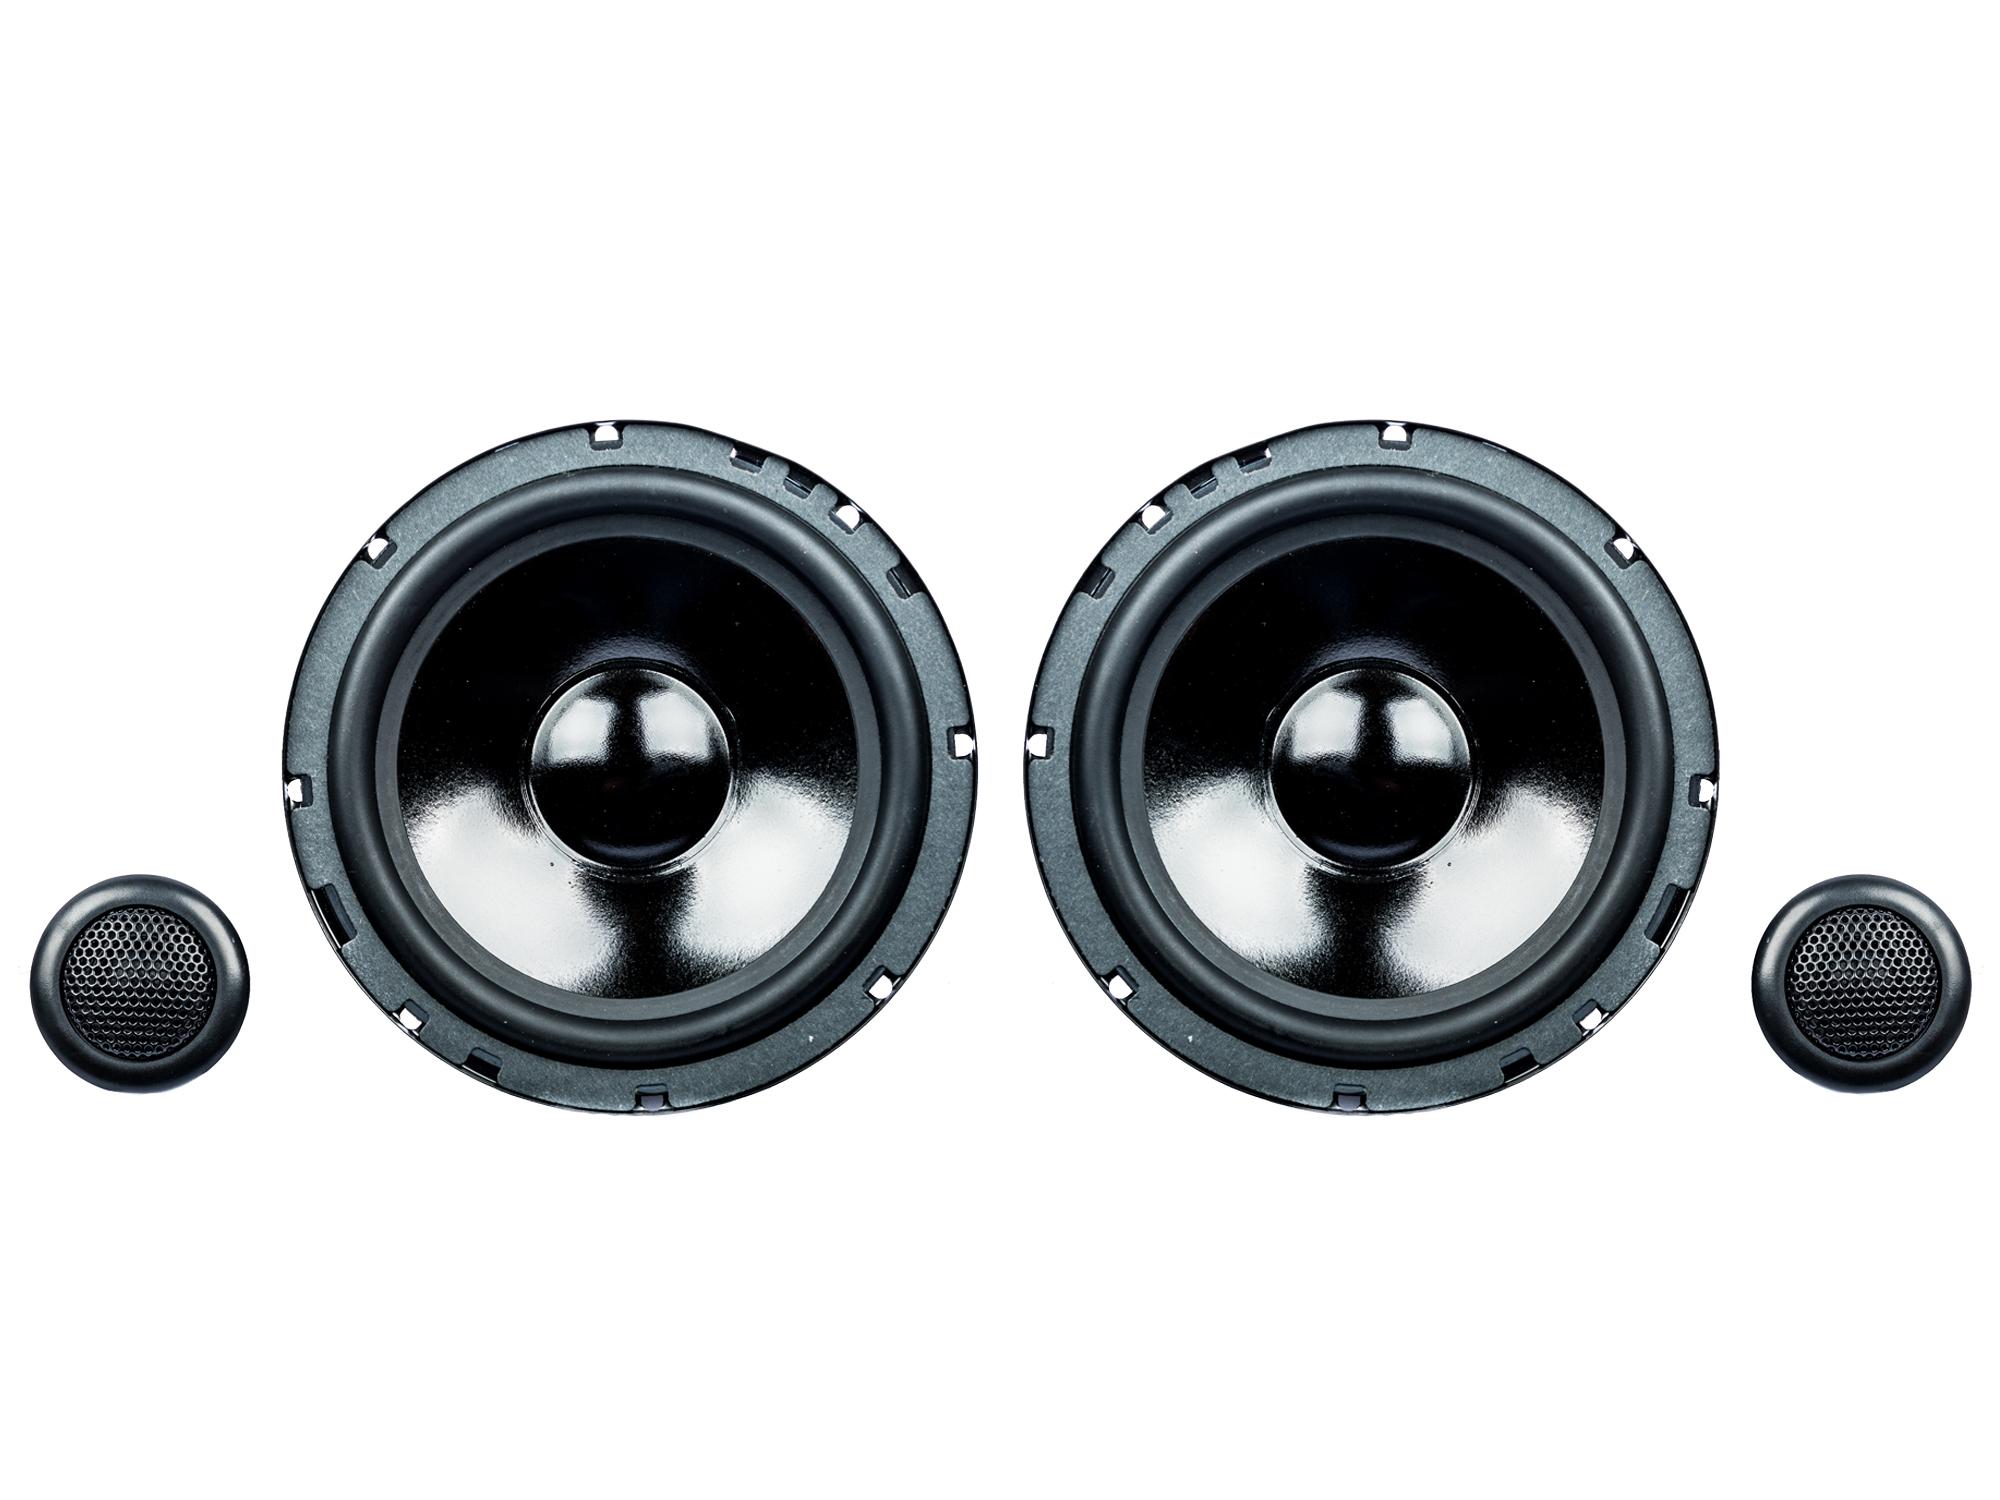 PG Audio 13 cm 2 Wege Kompo Auto Lautsprecher 2.13 Neu 120 Watt 001